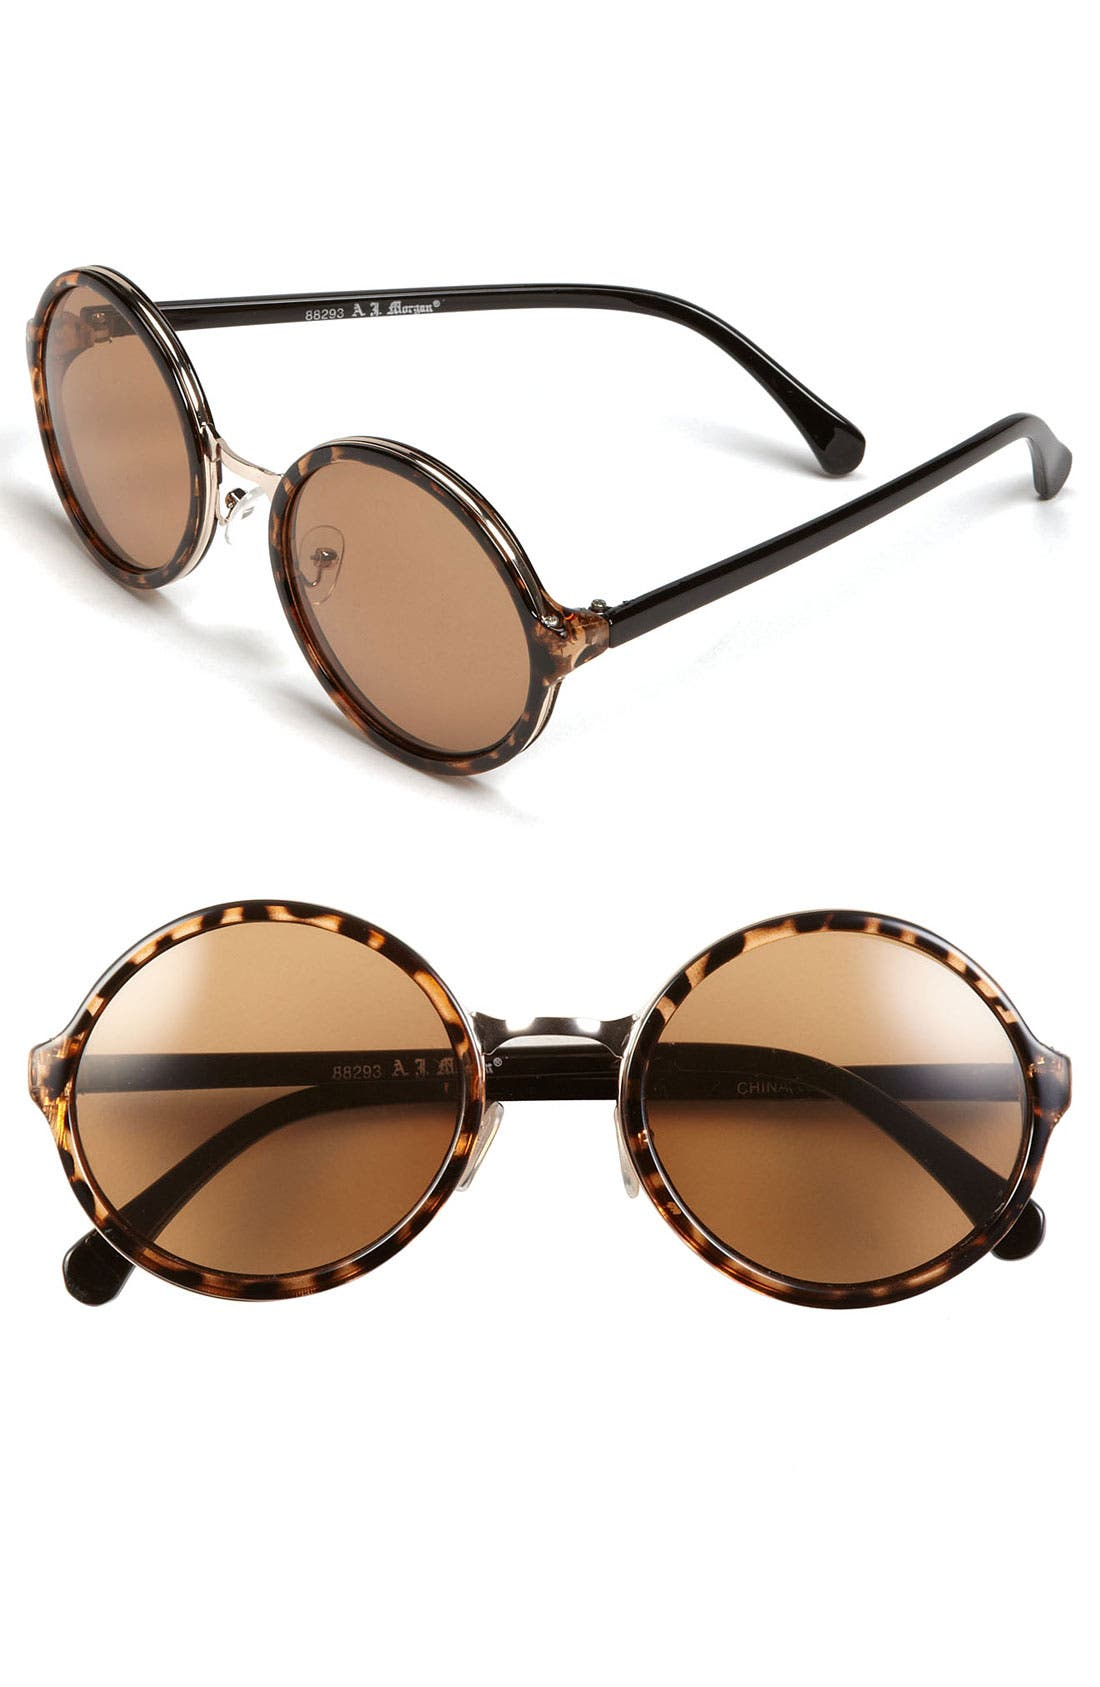 Alternate Image 1 Selected - A.J. Morgan 52mm Retro Round Sunglasses